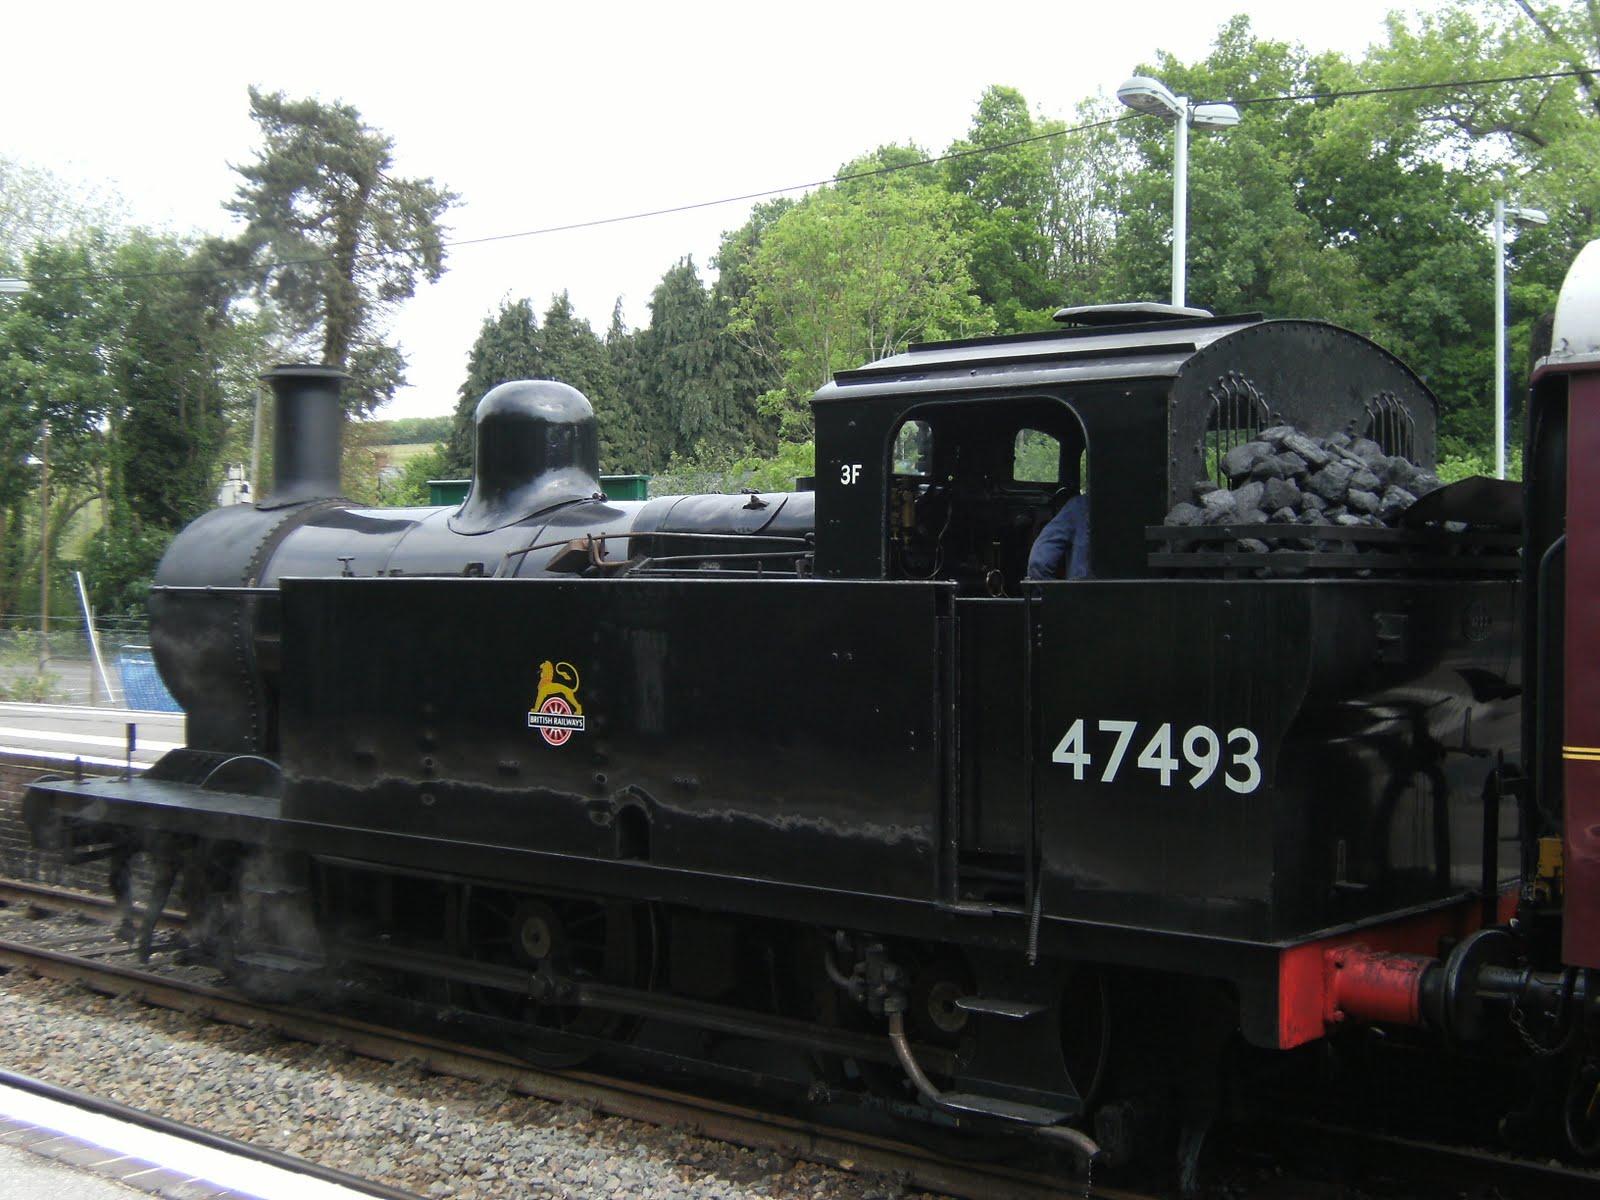 DSCF7790 The 1110 ready to depart for Tunbridge Wells West